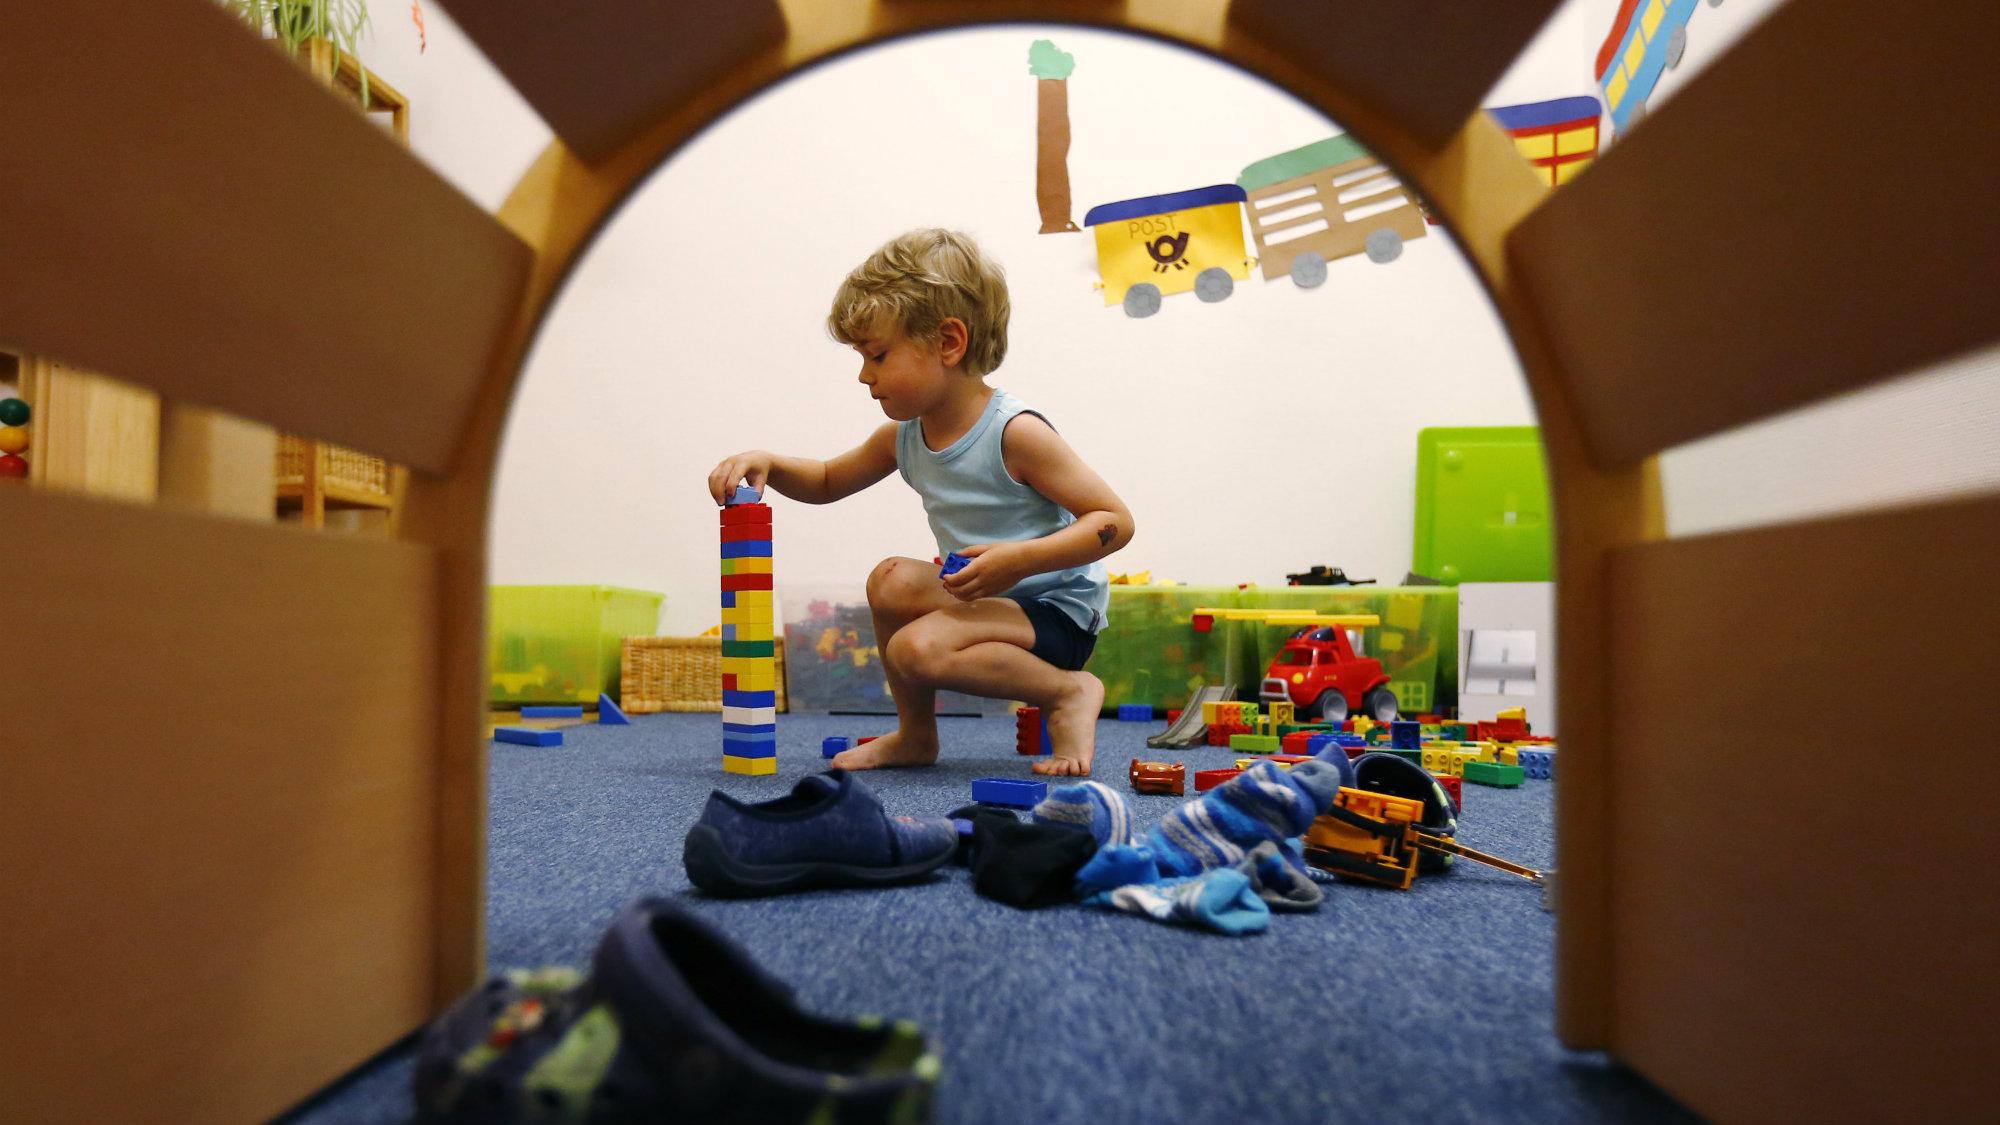 Learning And Teaching Lego Nursery School Play